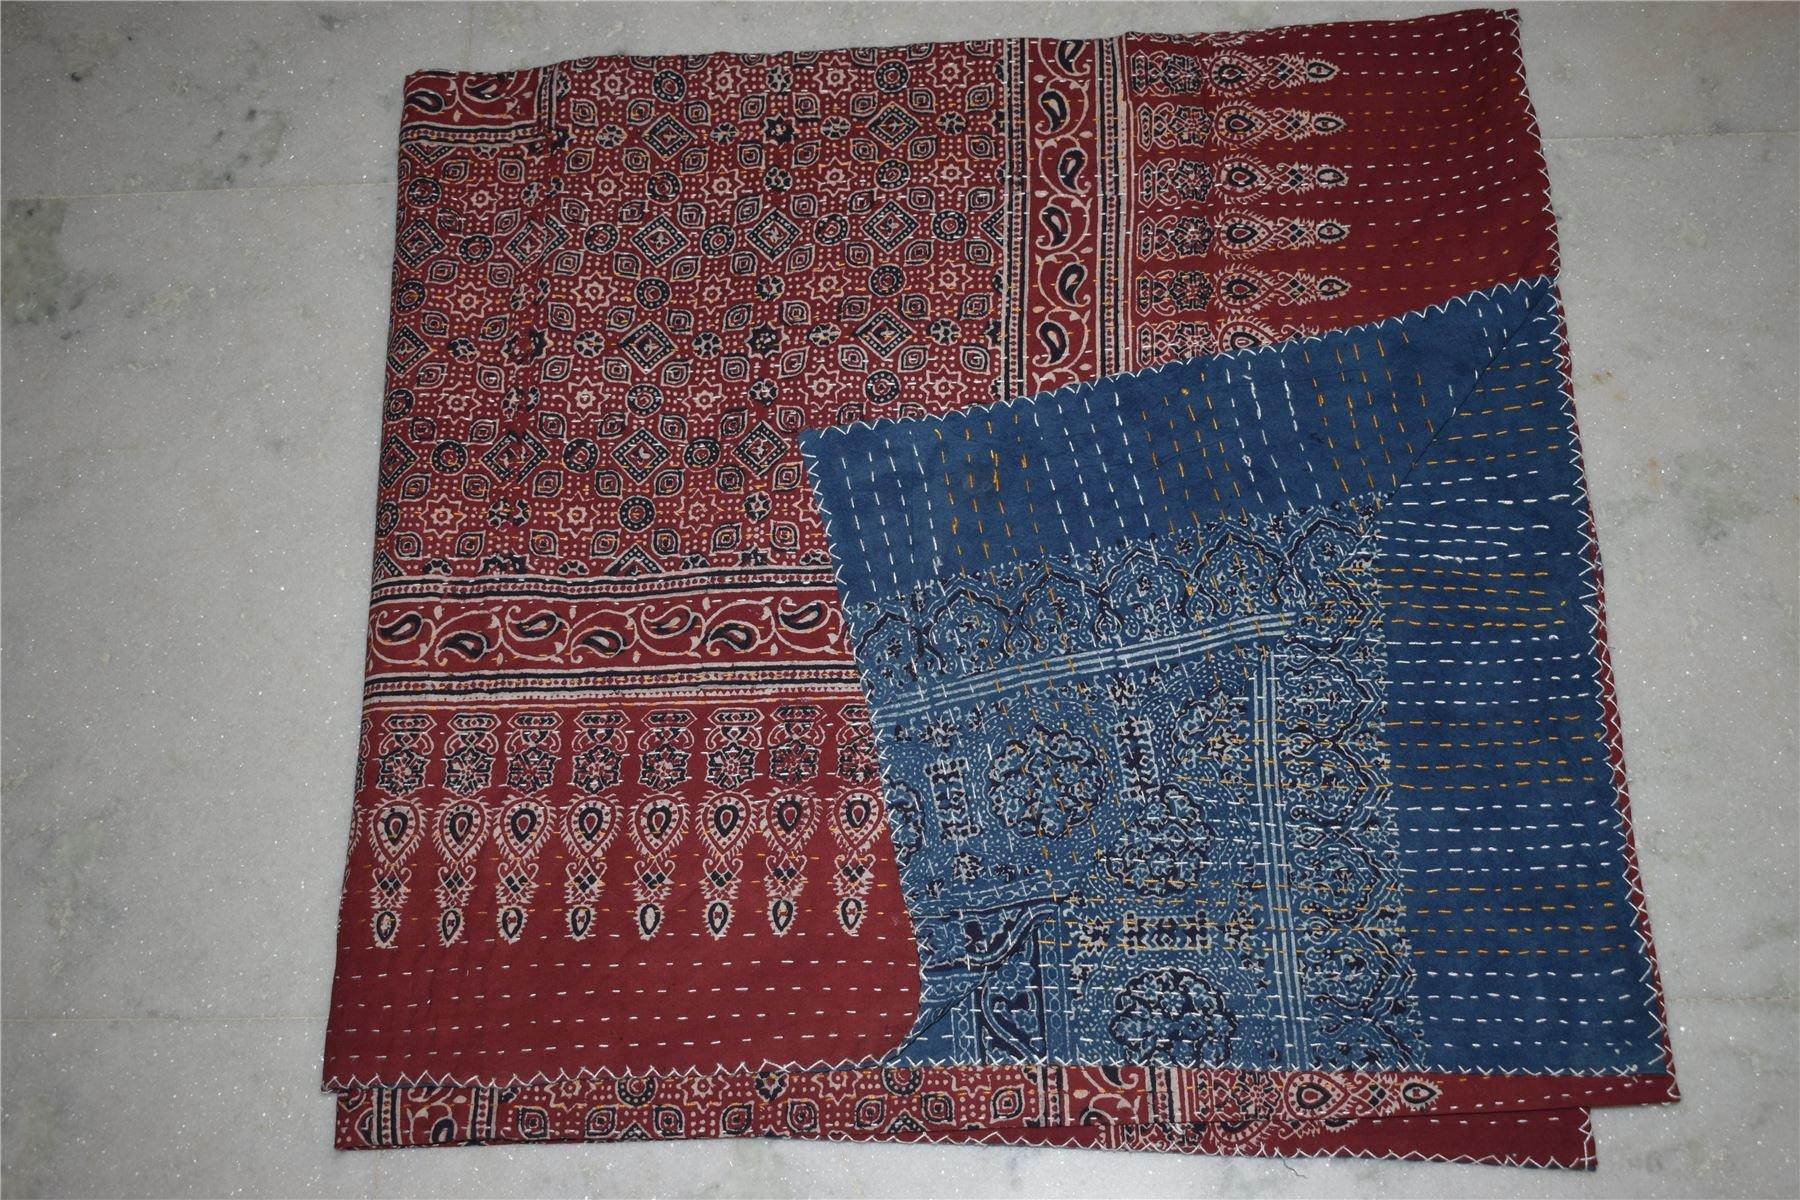 KING Kantha Quilt Textile block print handmade throw vegetable ajarak prints12